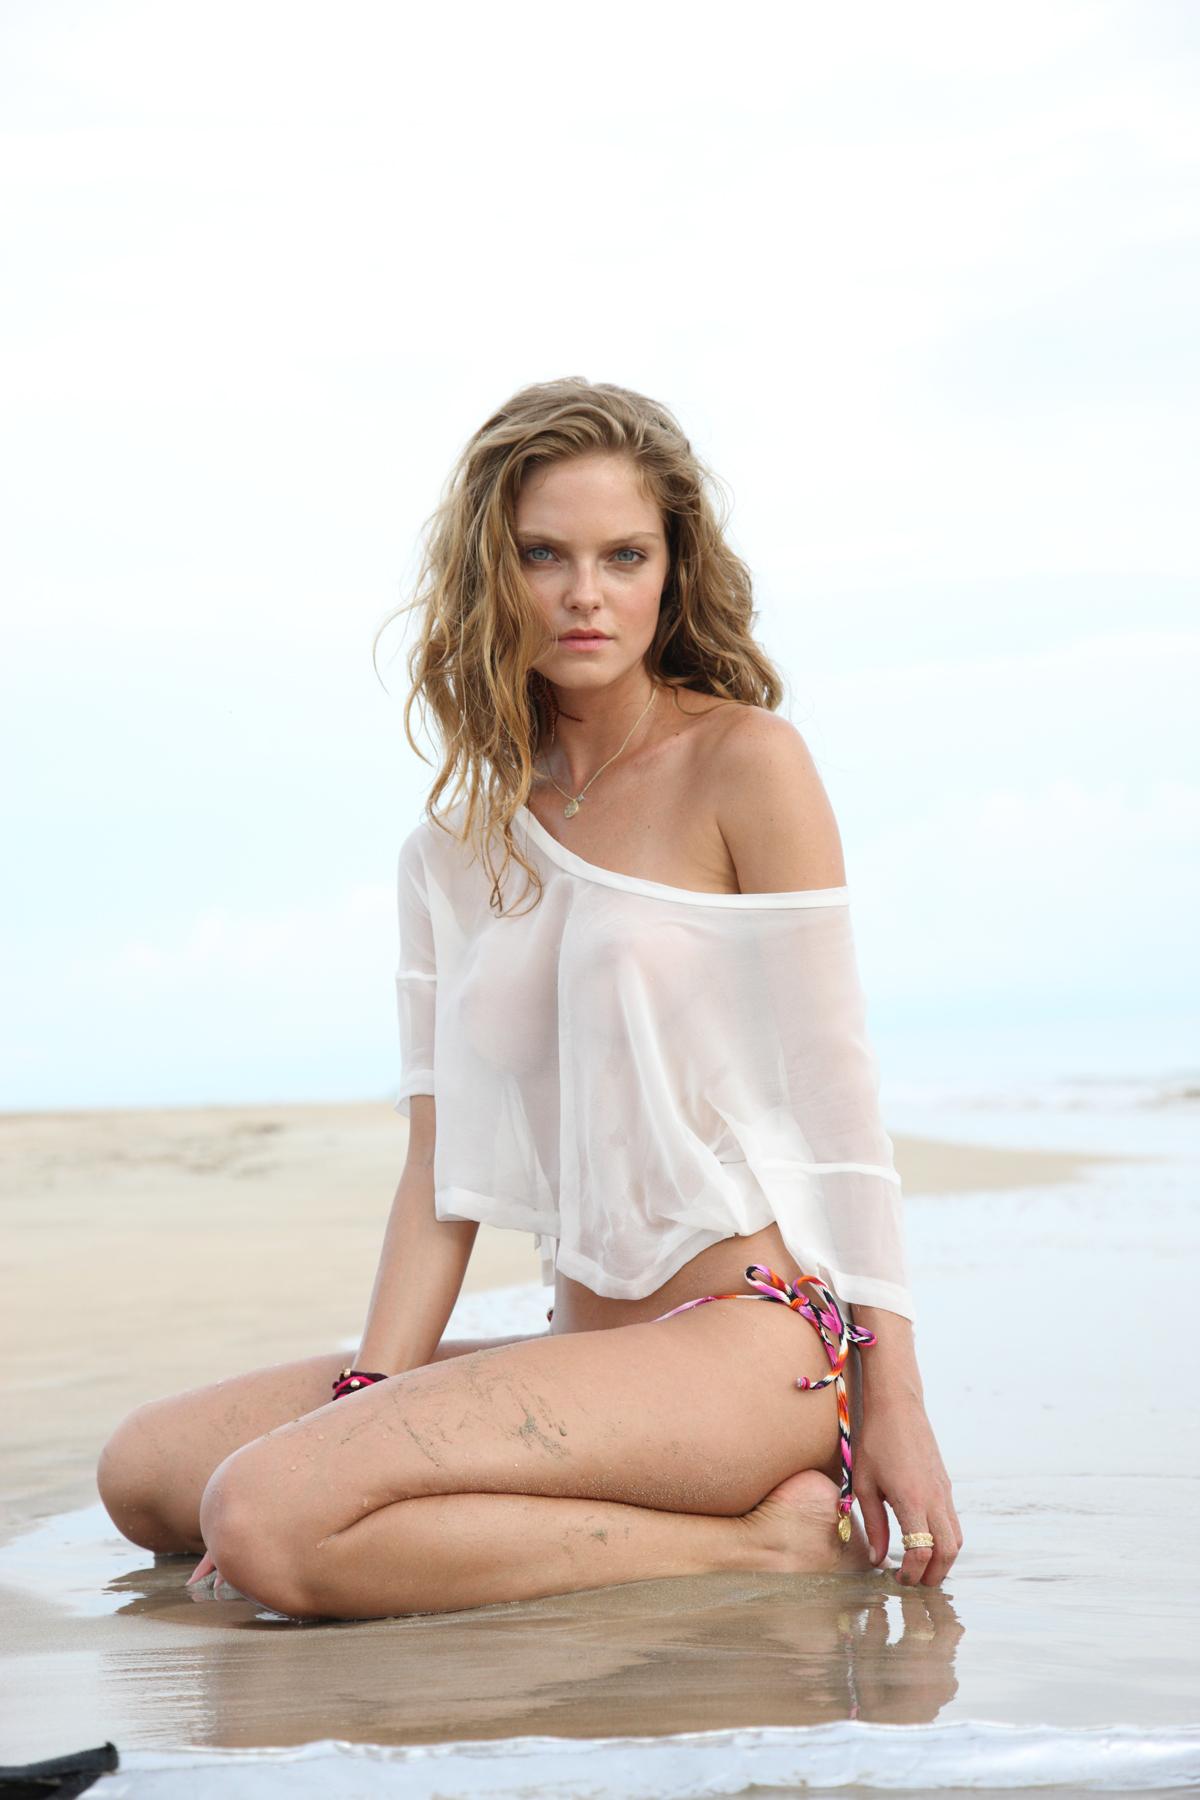 Jessica Perez in Panama, SI Swimsuit 2012